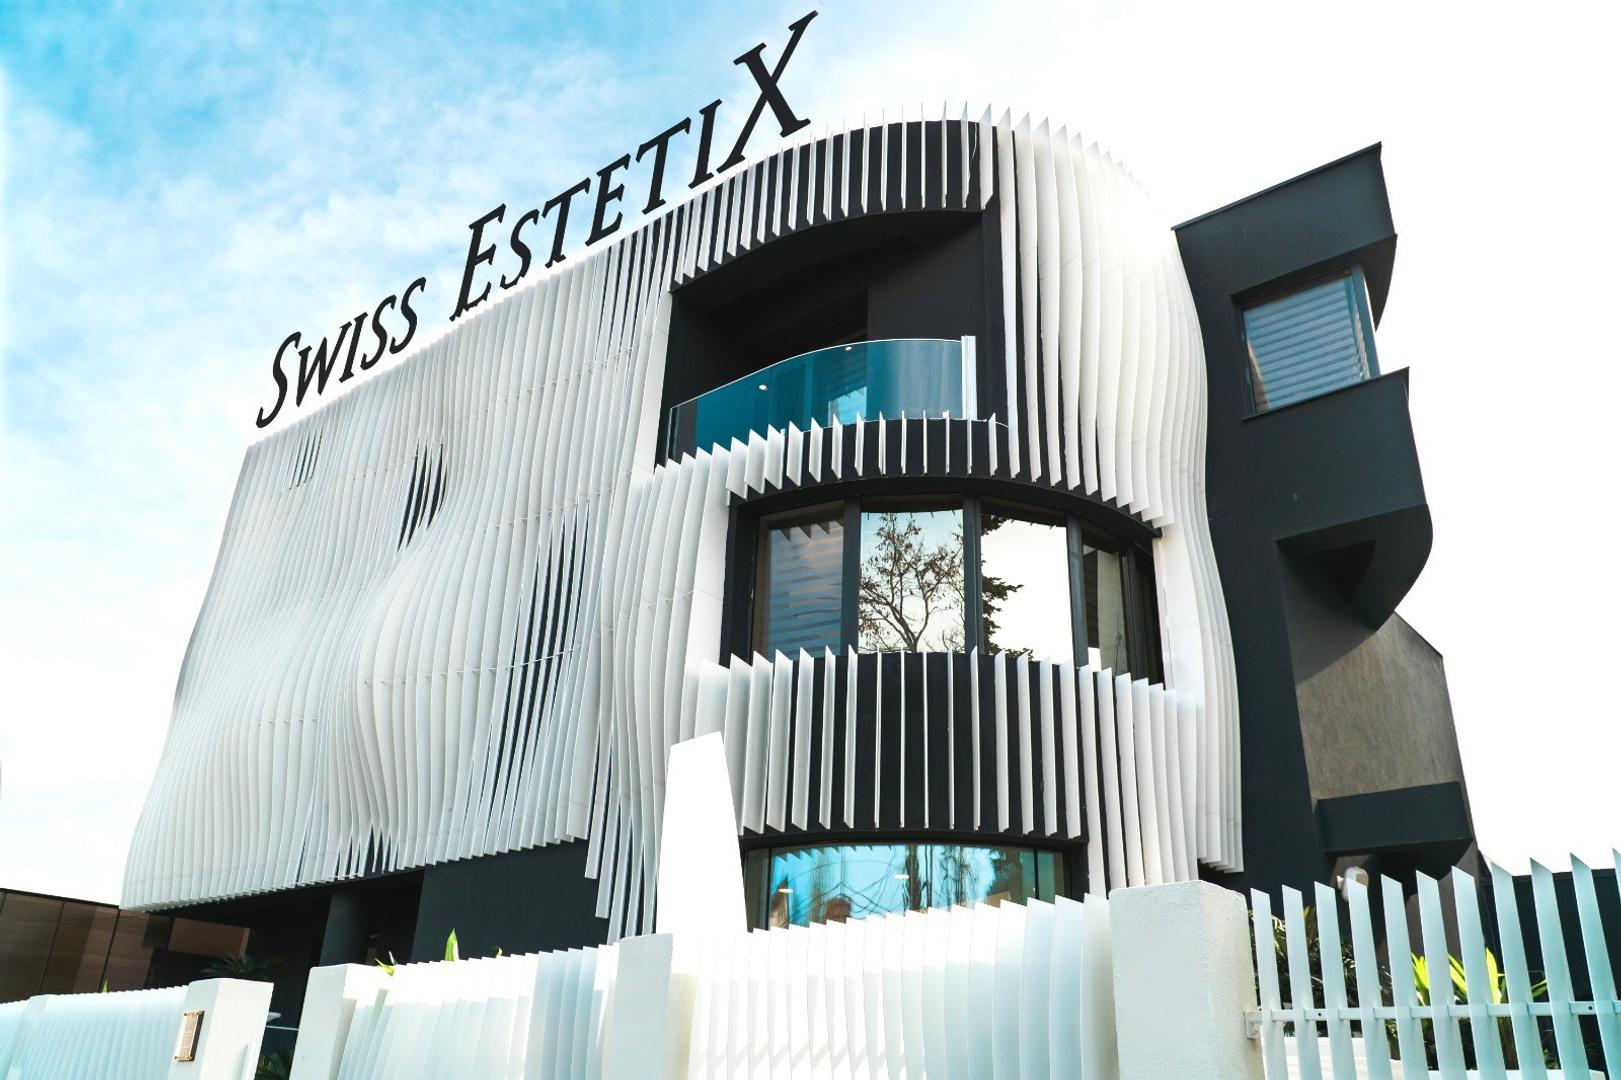 SWISS ESTETIX